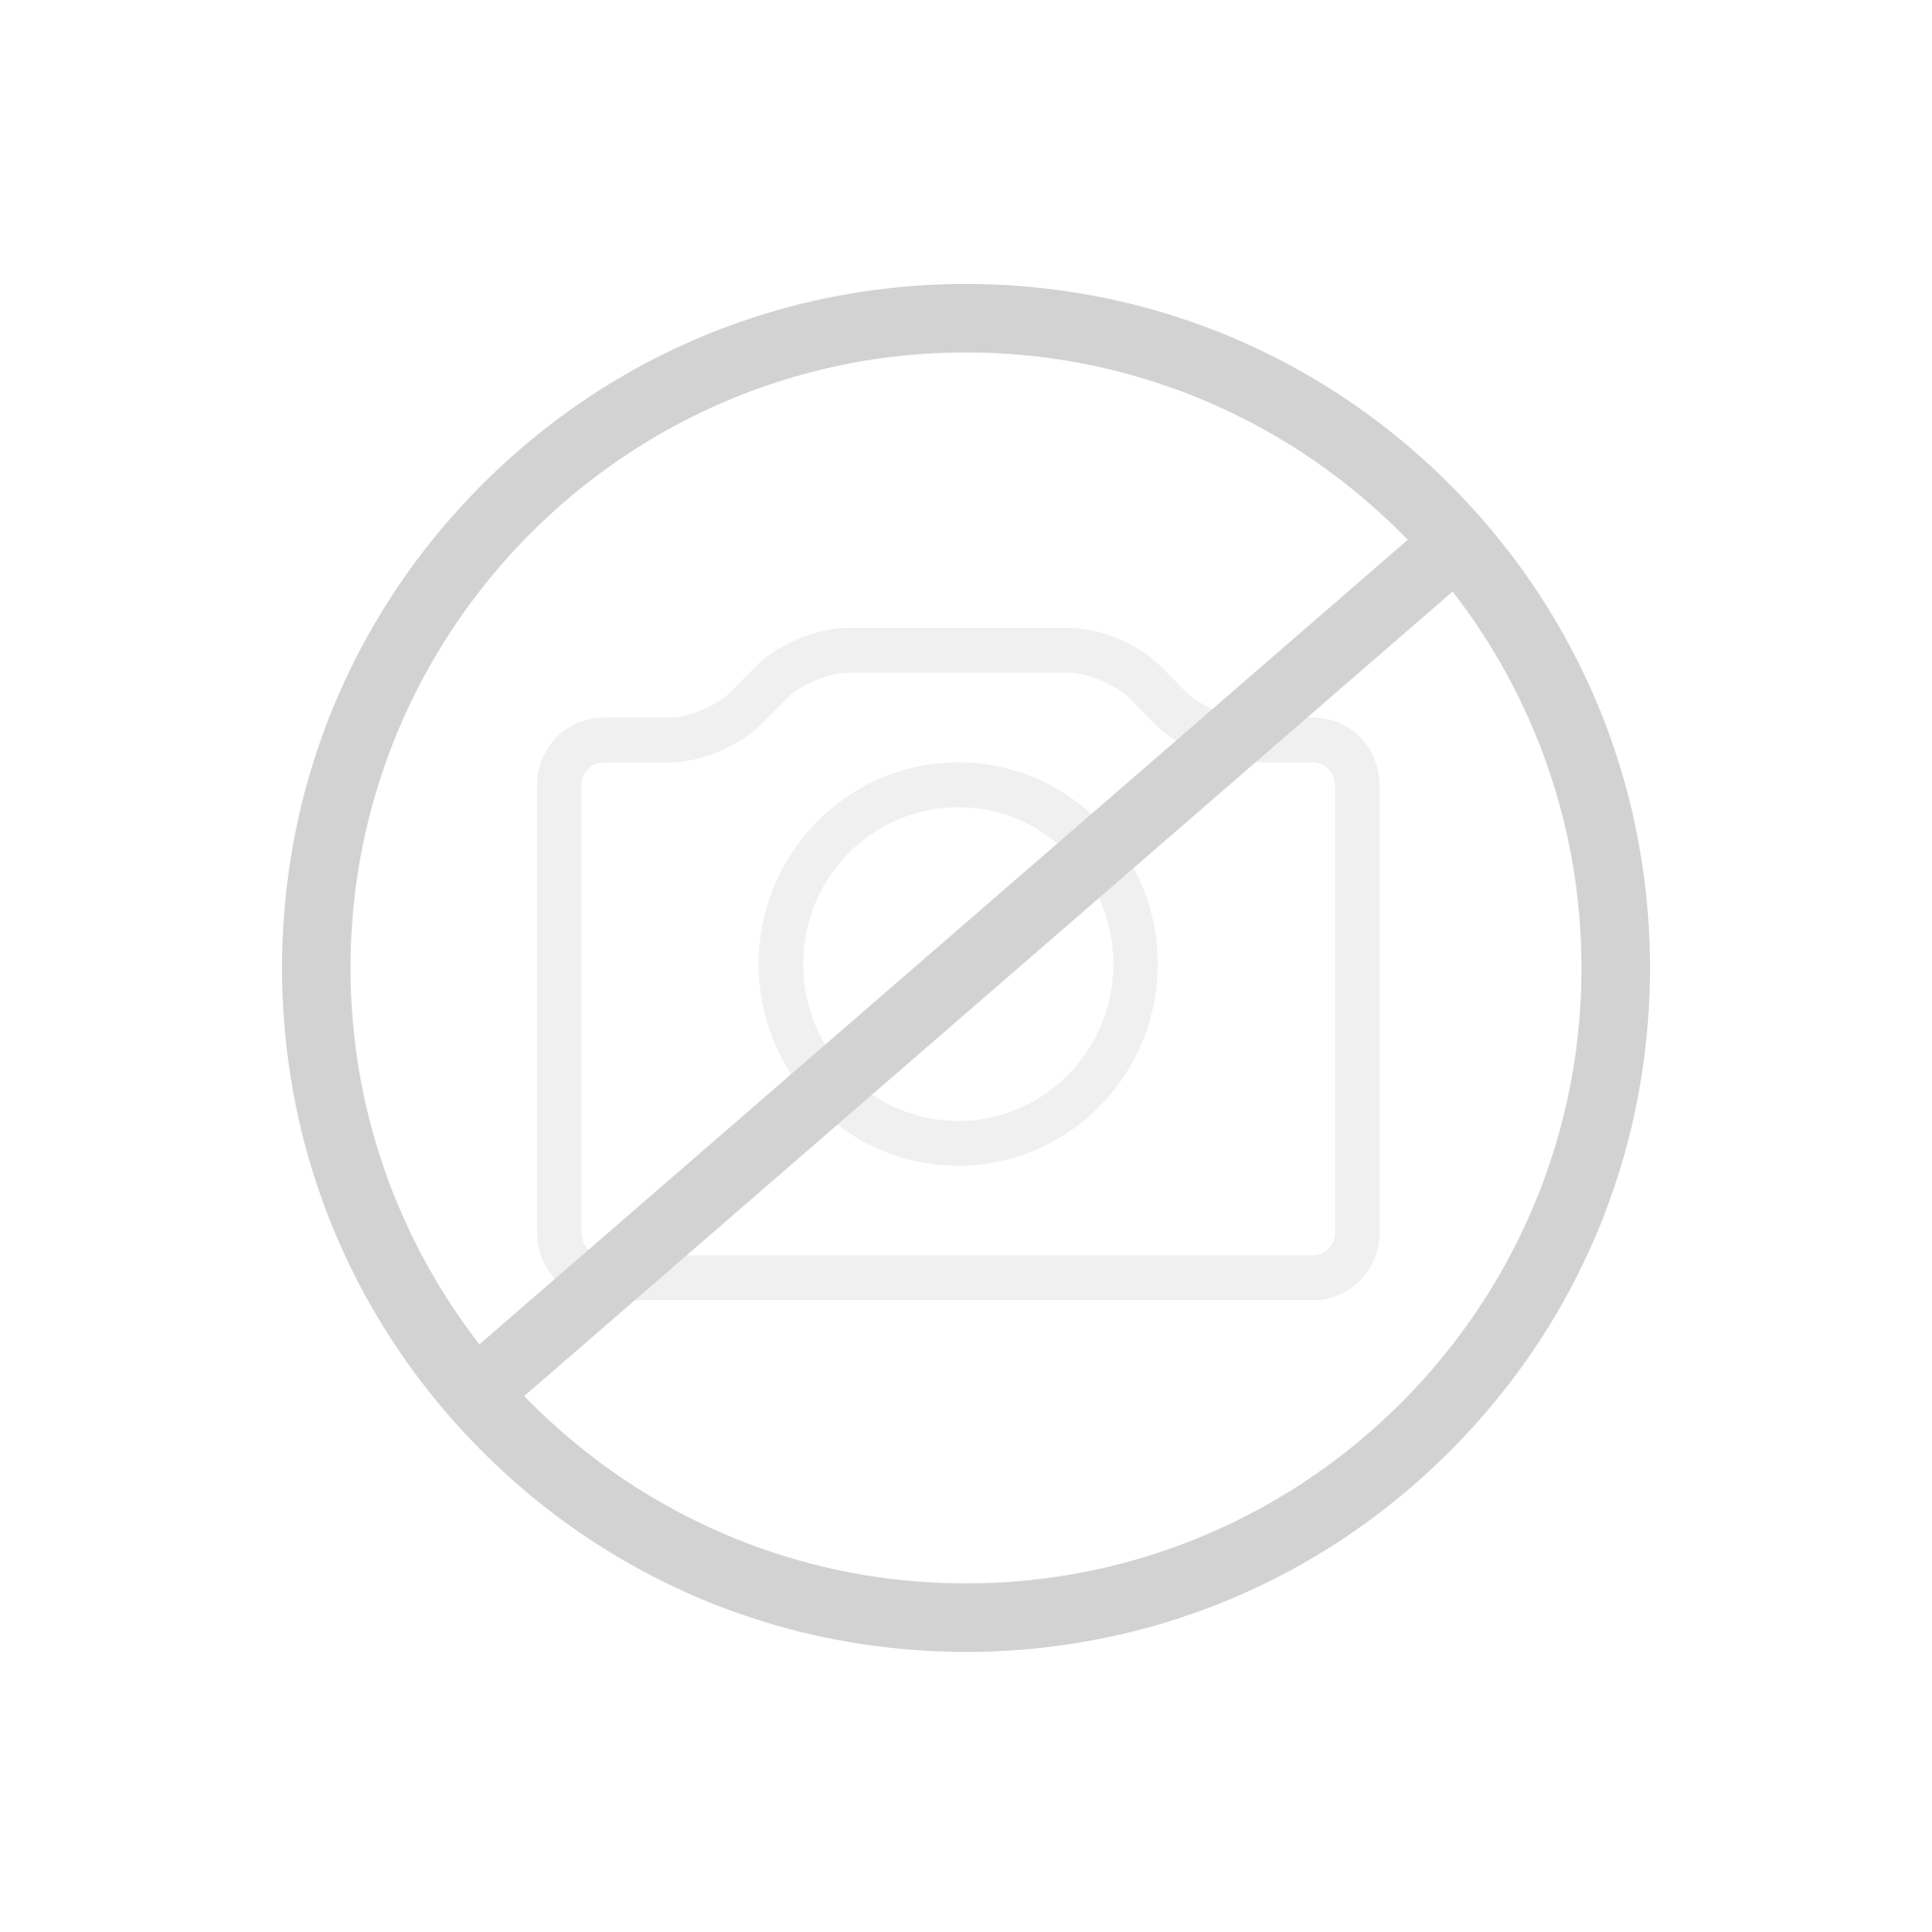 geberit monolith sanit rmodul f r wand wt 2 loch armatur mischer rechts auszug links glas wei. Black Bedroom Furniture Sets. Home Design Ideas